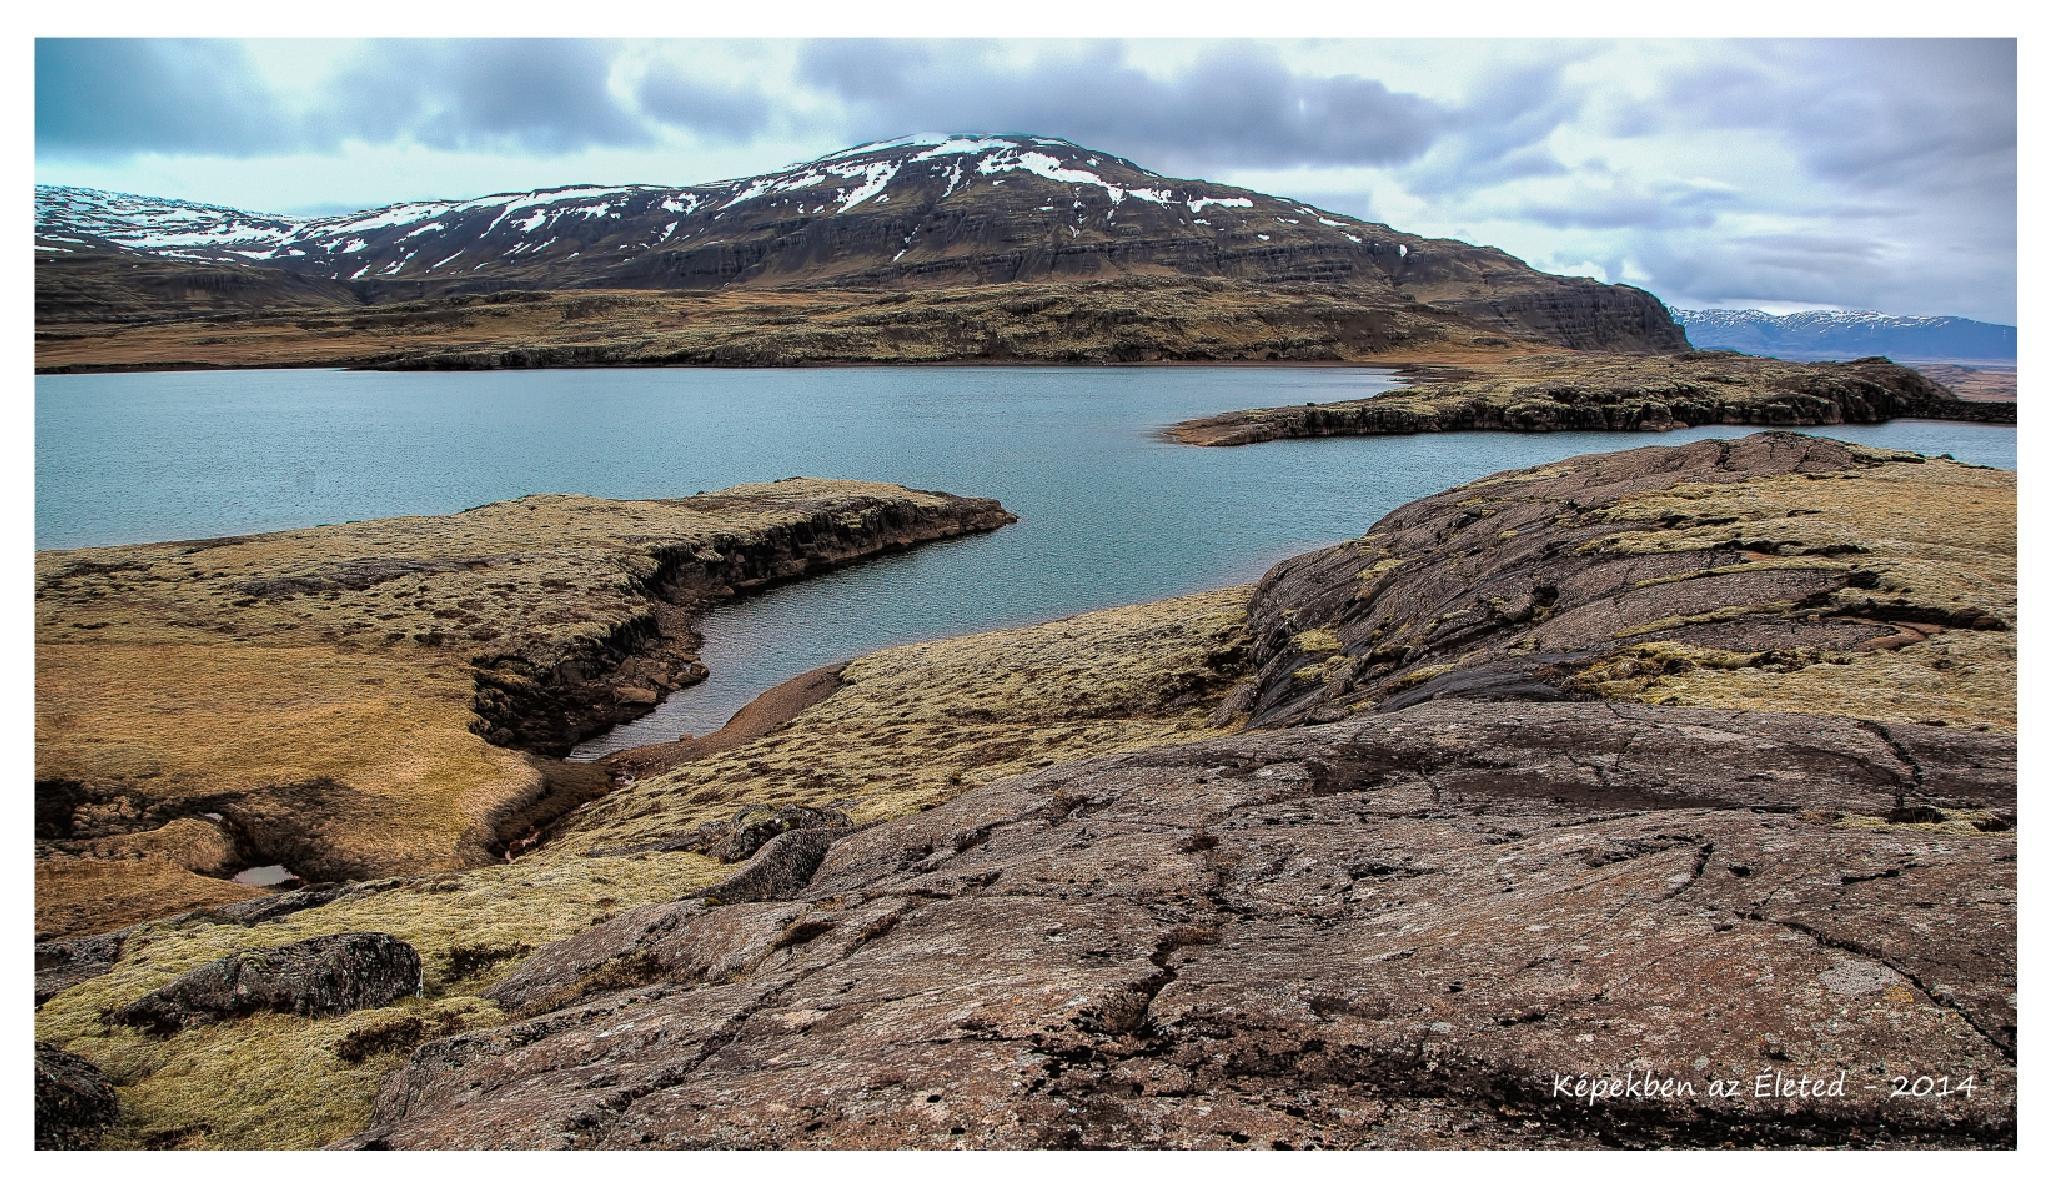 Iceland landscape by Tibor Sari